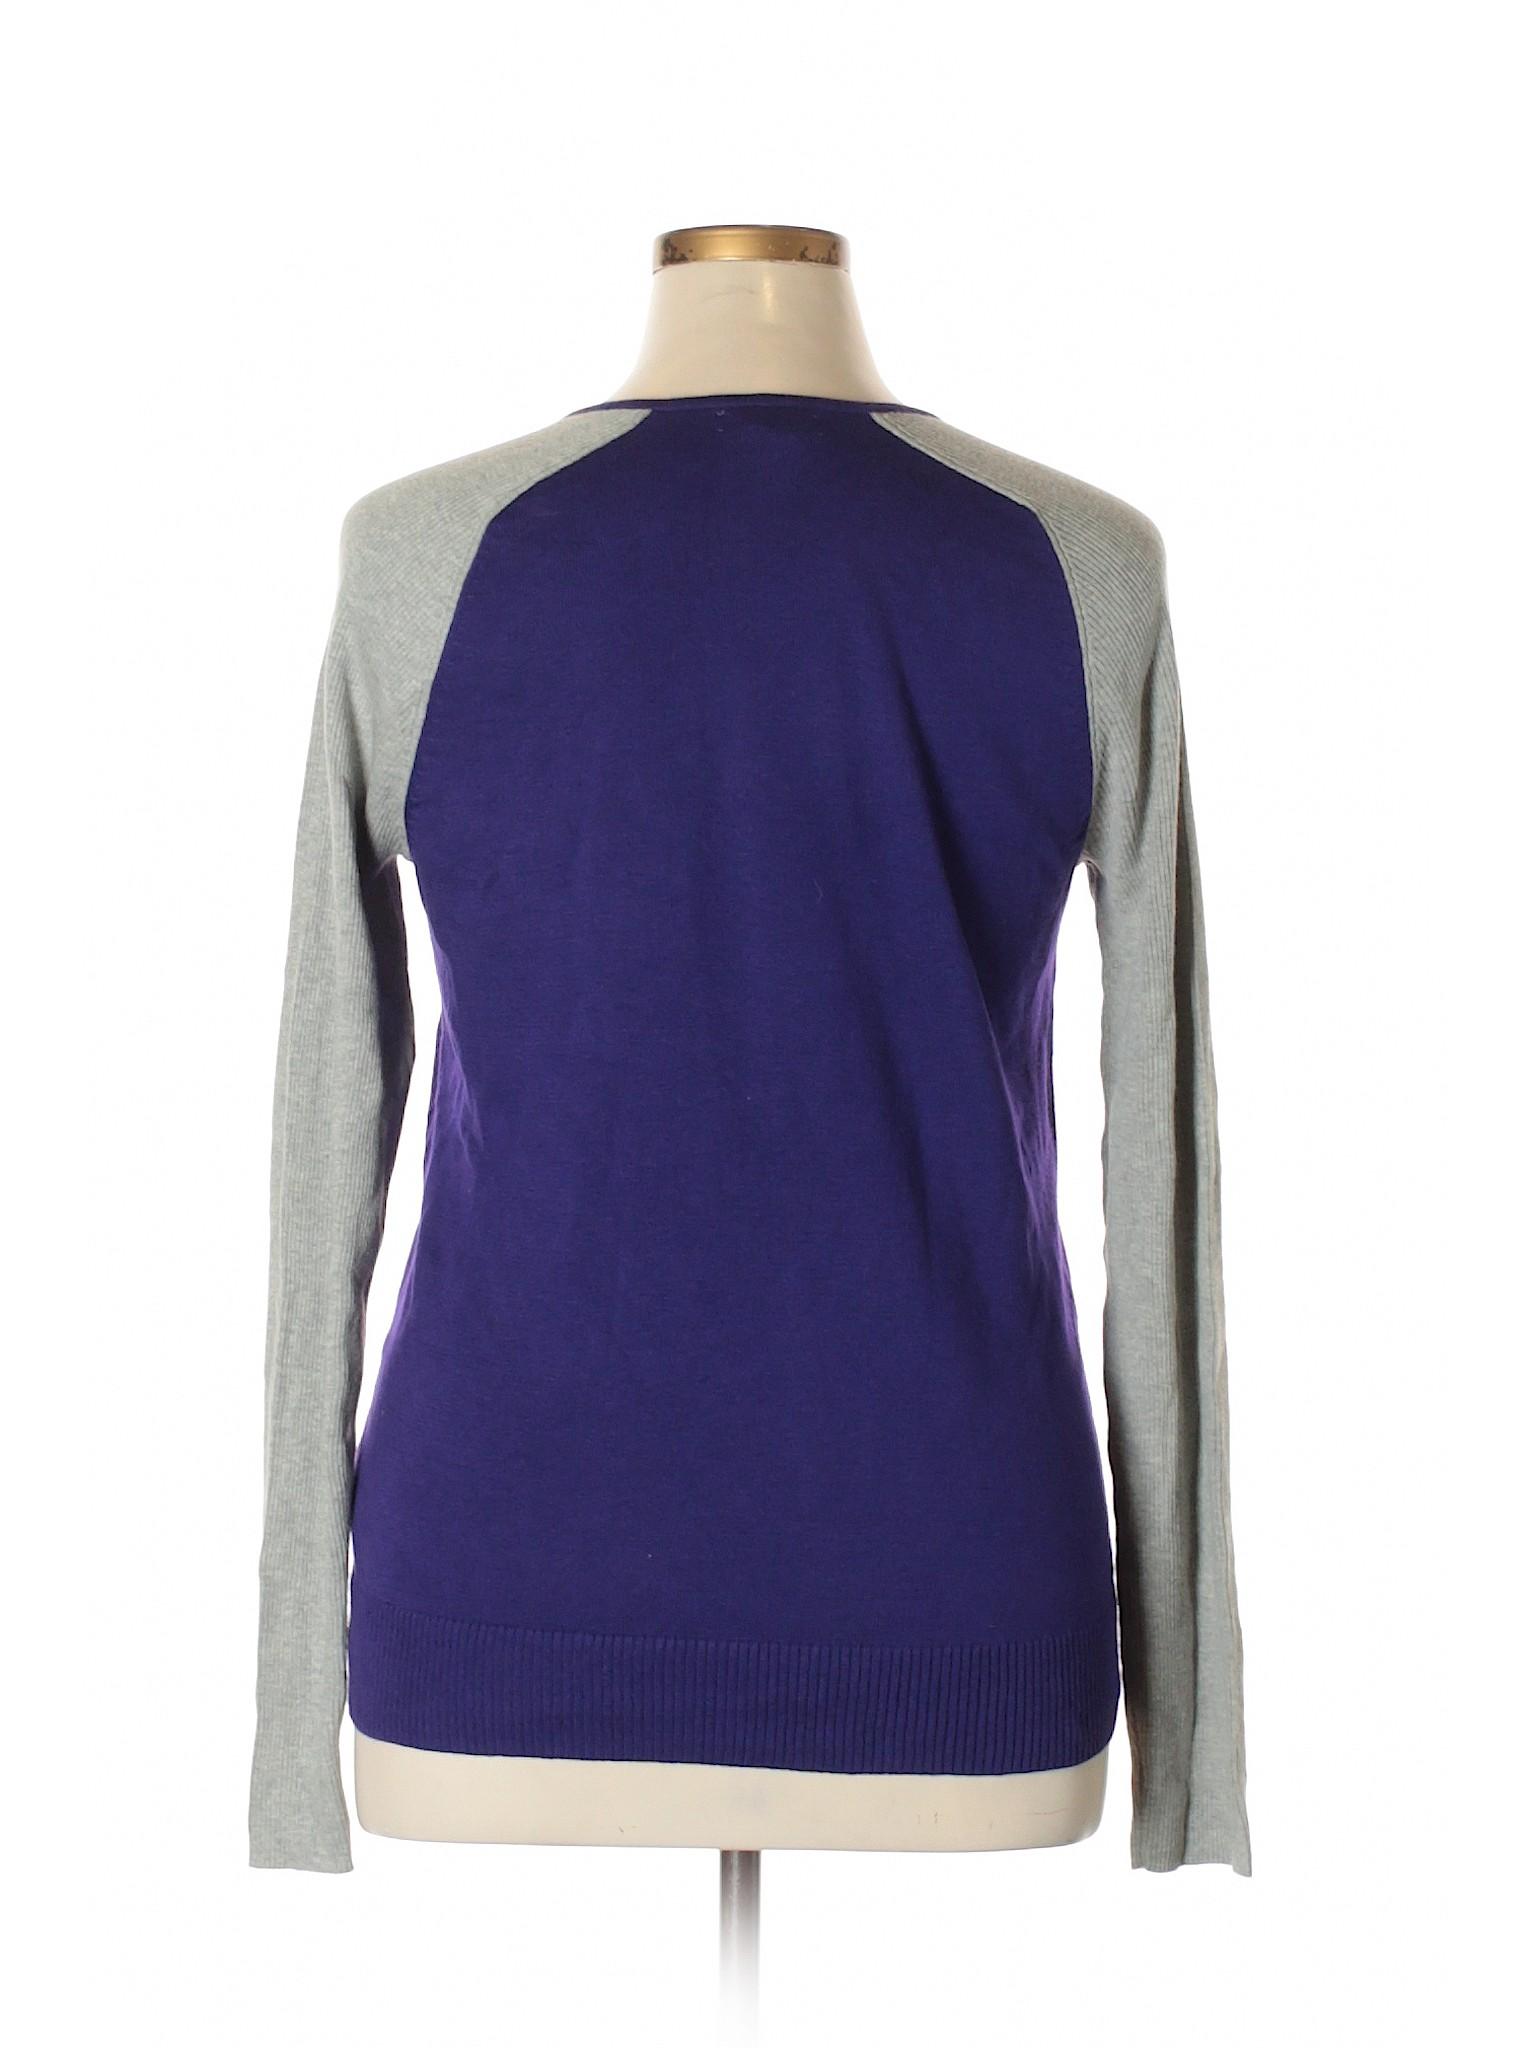 Boutique Living American Boutique Living American Boutique Sweater Pullover Living Pullover Sweater Boutique Sweater Pullover American qtwTApfBx